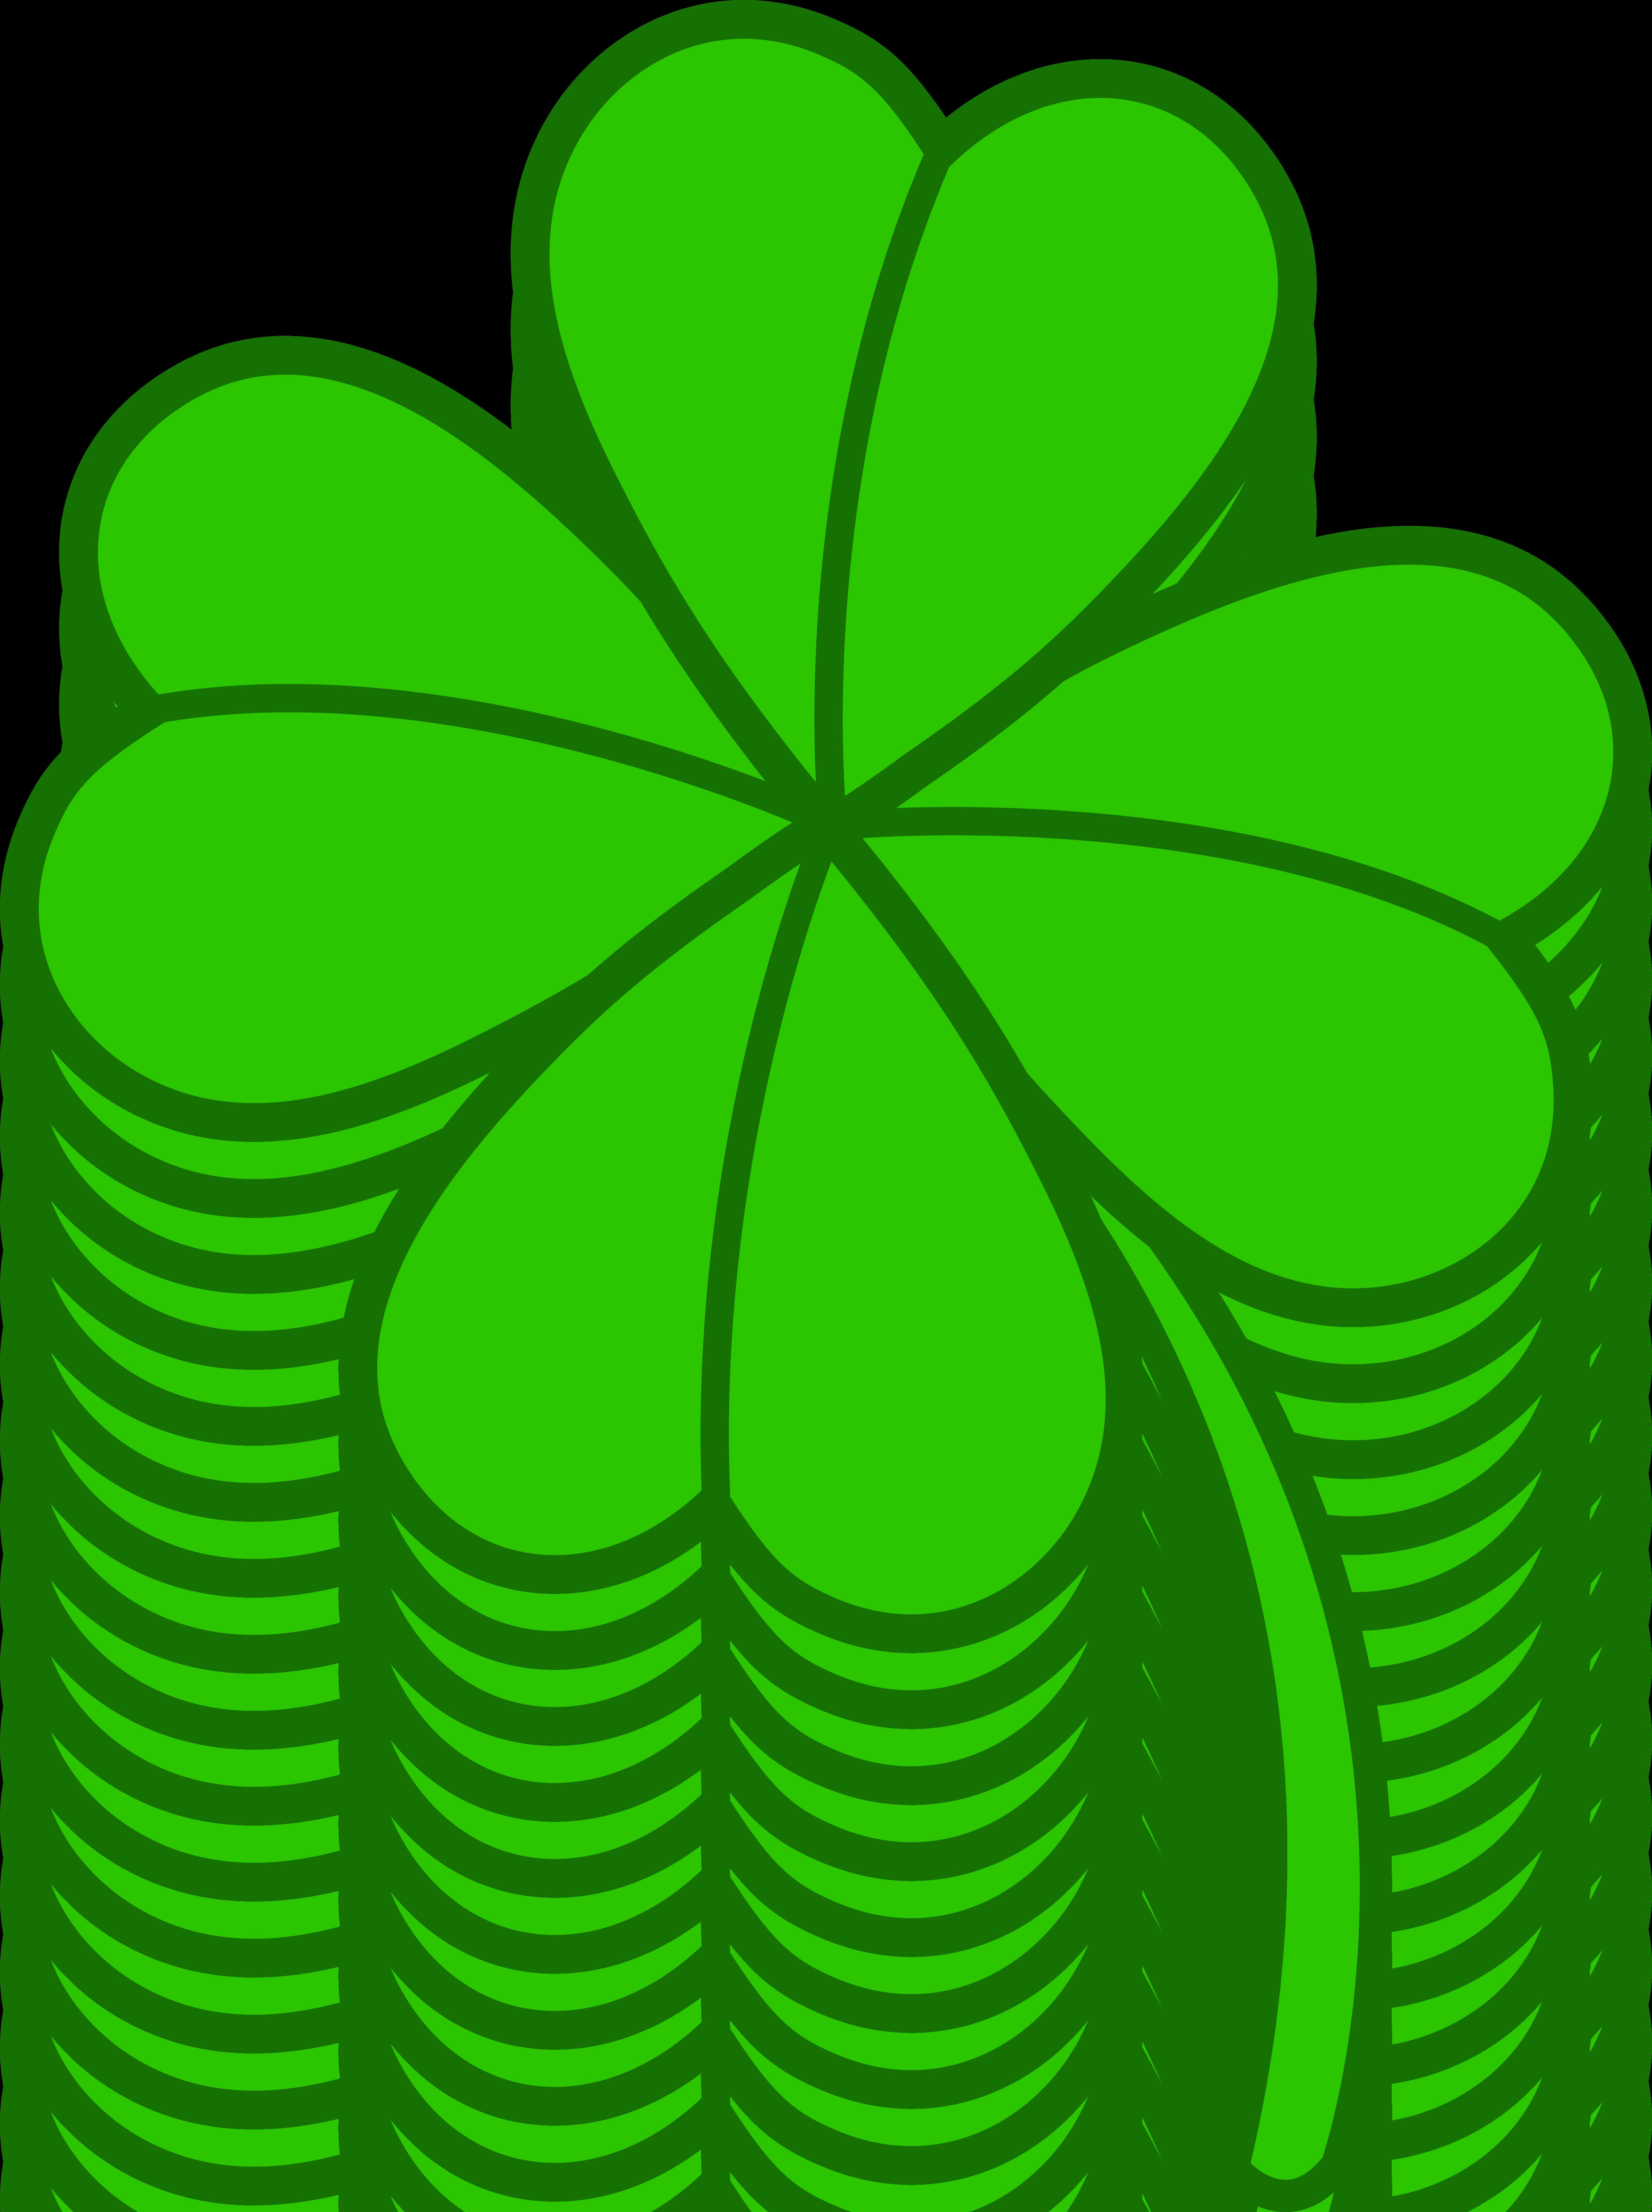 Free Clover Leaf Images, Download Free Clip Art, Free Clip.